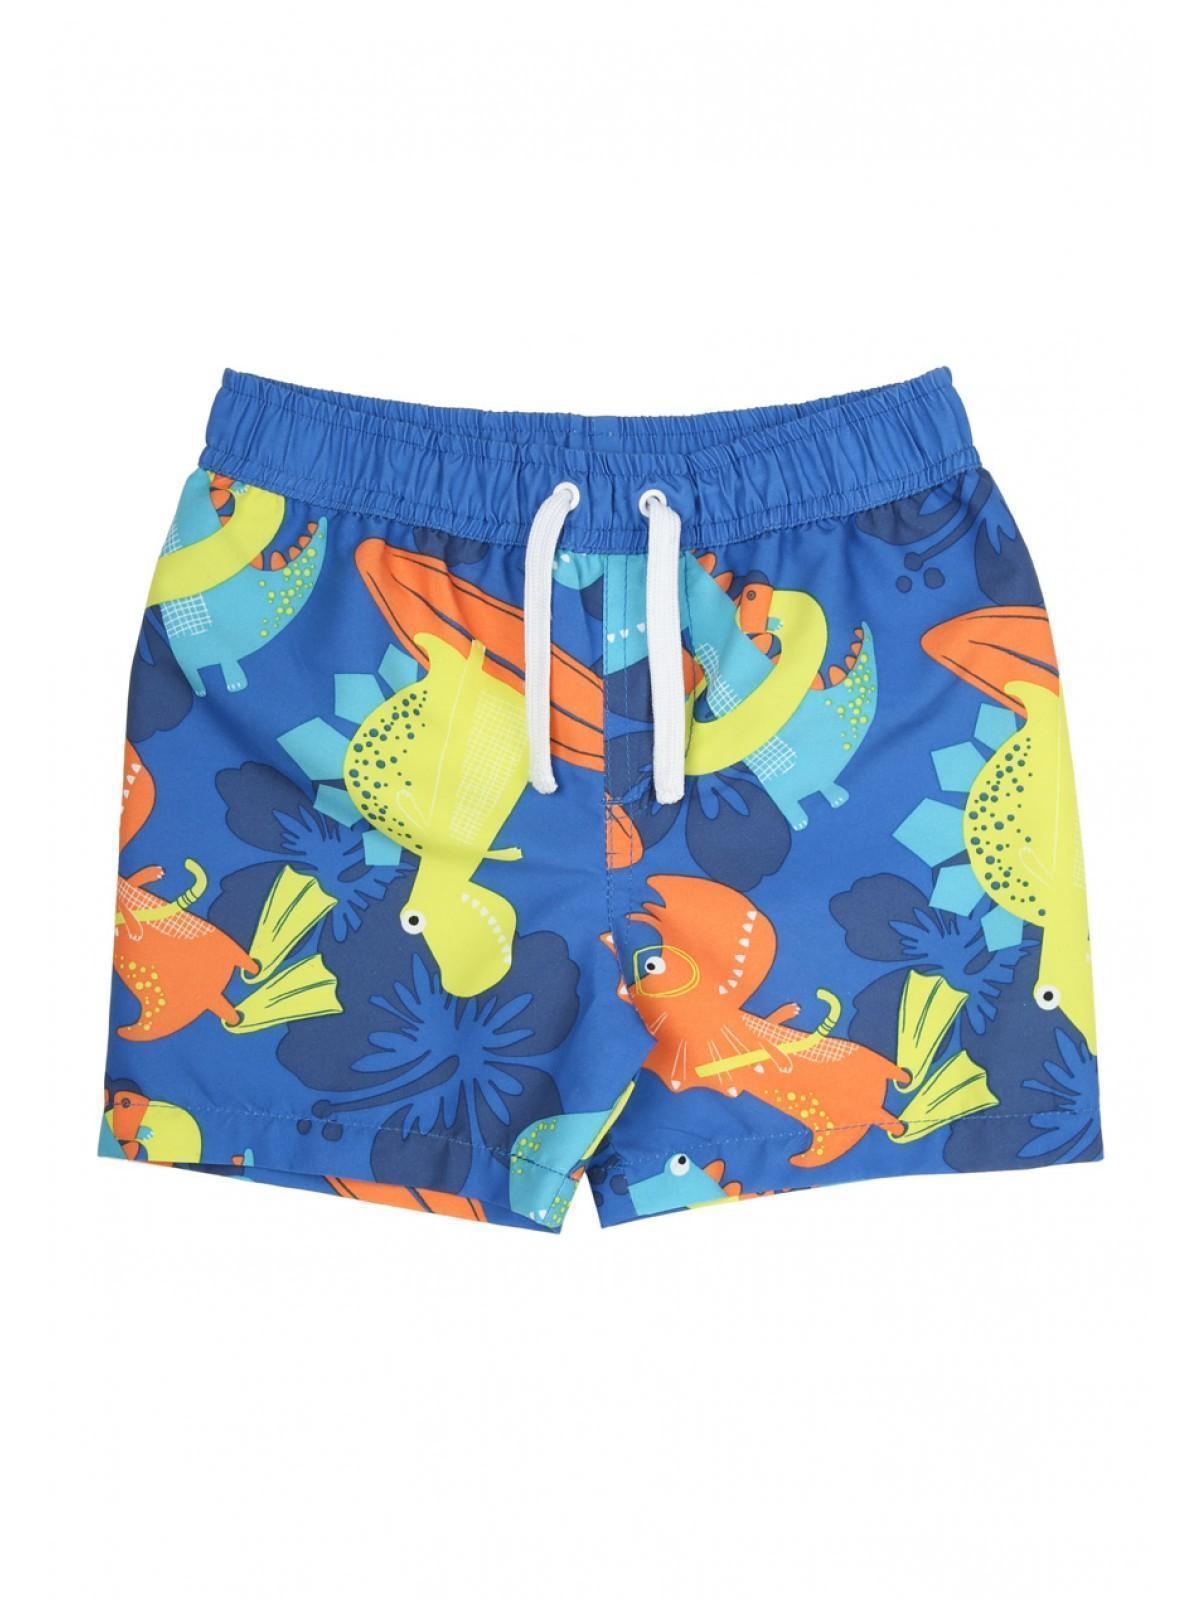 e7f9f7664b Home; Younger Boys Dinosaur Print Swim Shorts. Back. PreviousNext